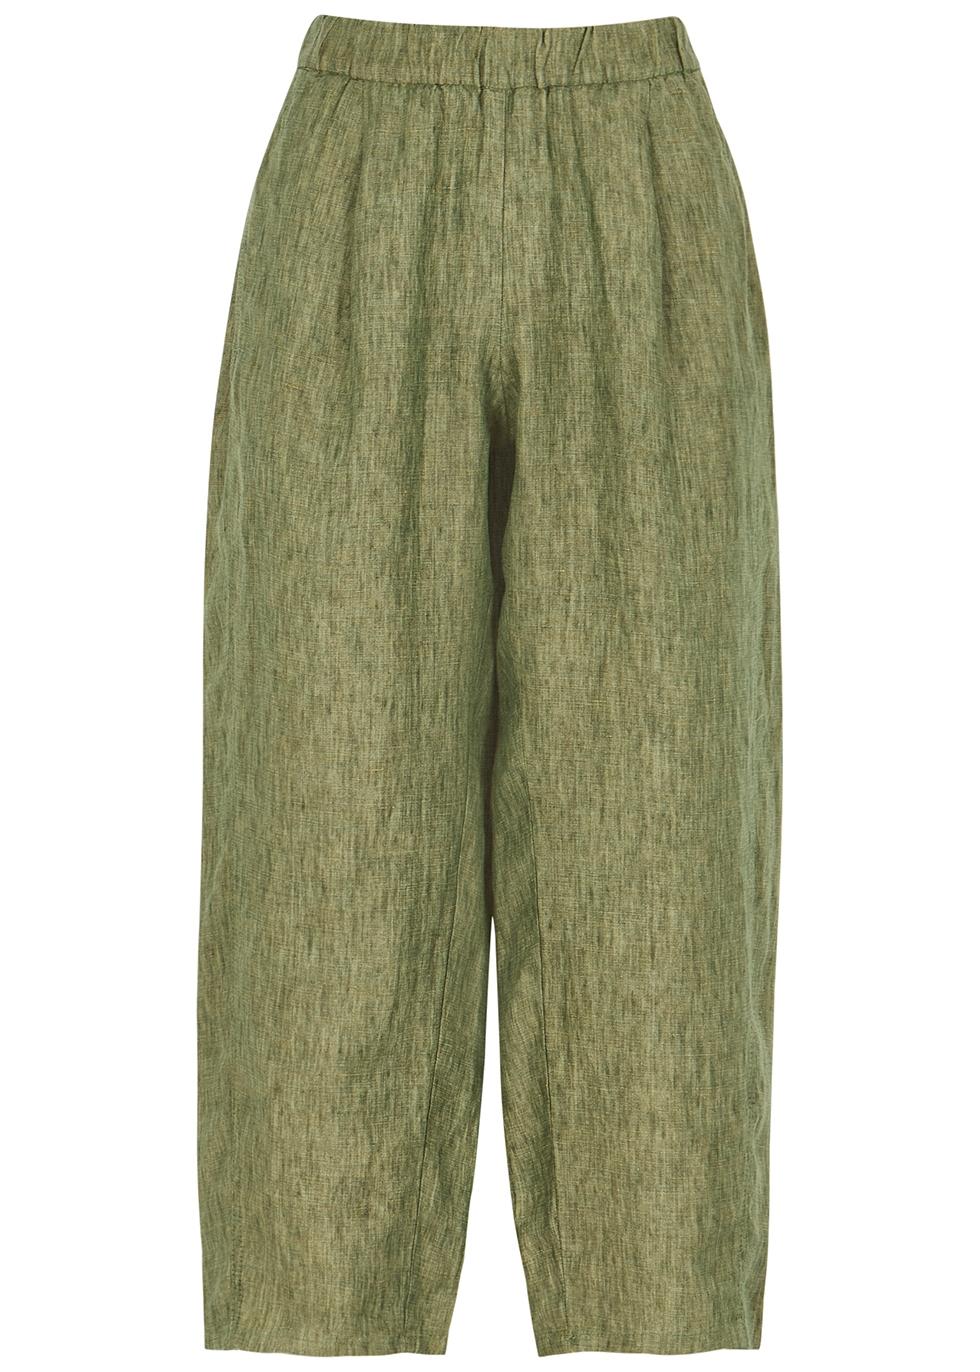 Green wide-leg cropped linen trousers